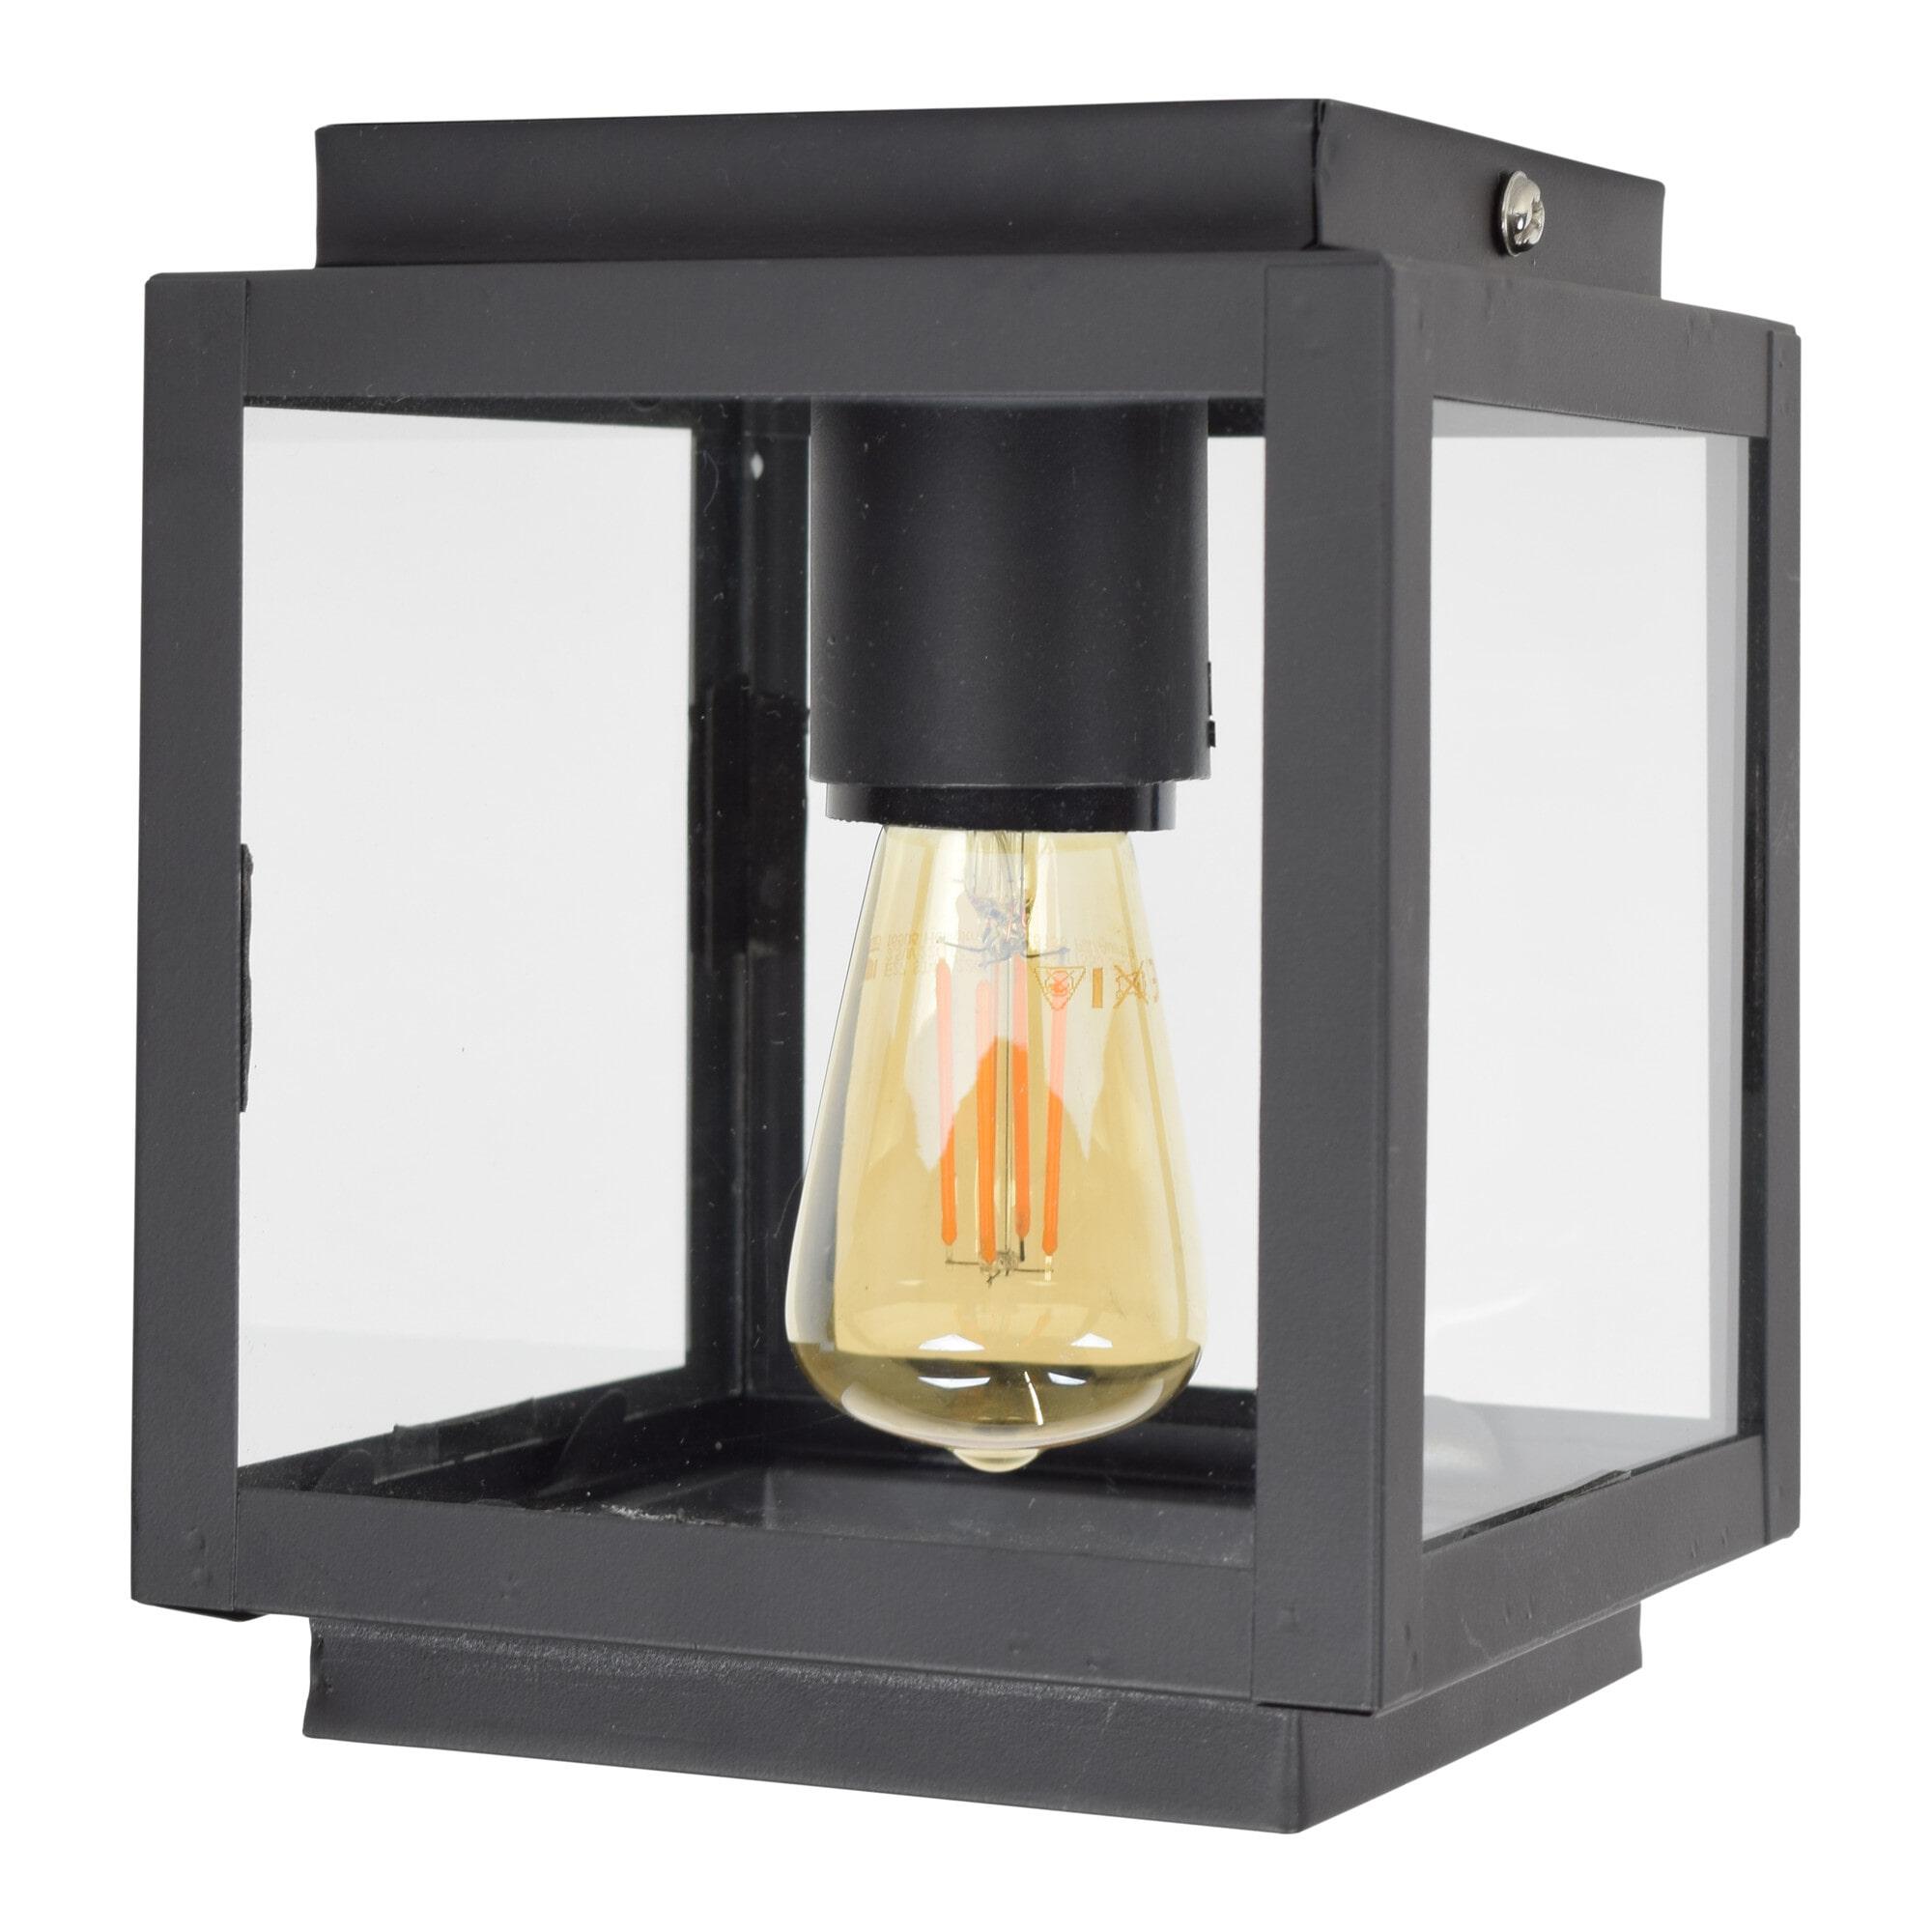 Urban Interiors plafondlamp 'Loft', kleur Vintage Black